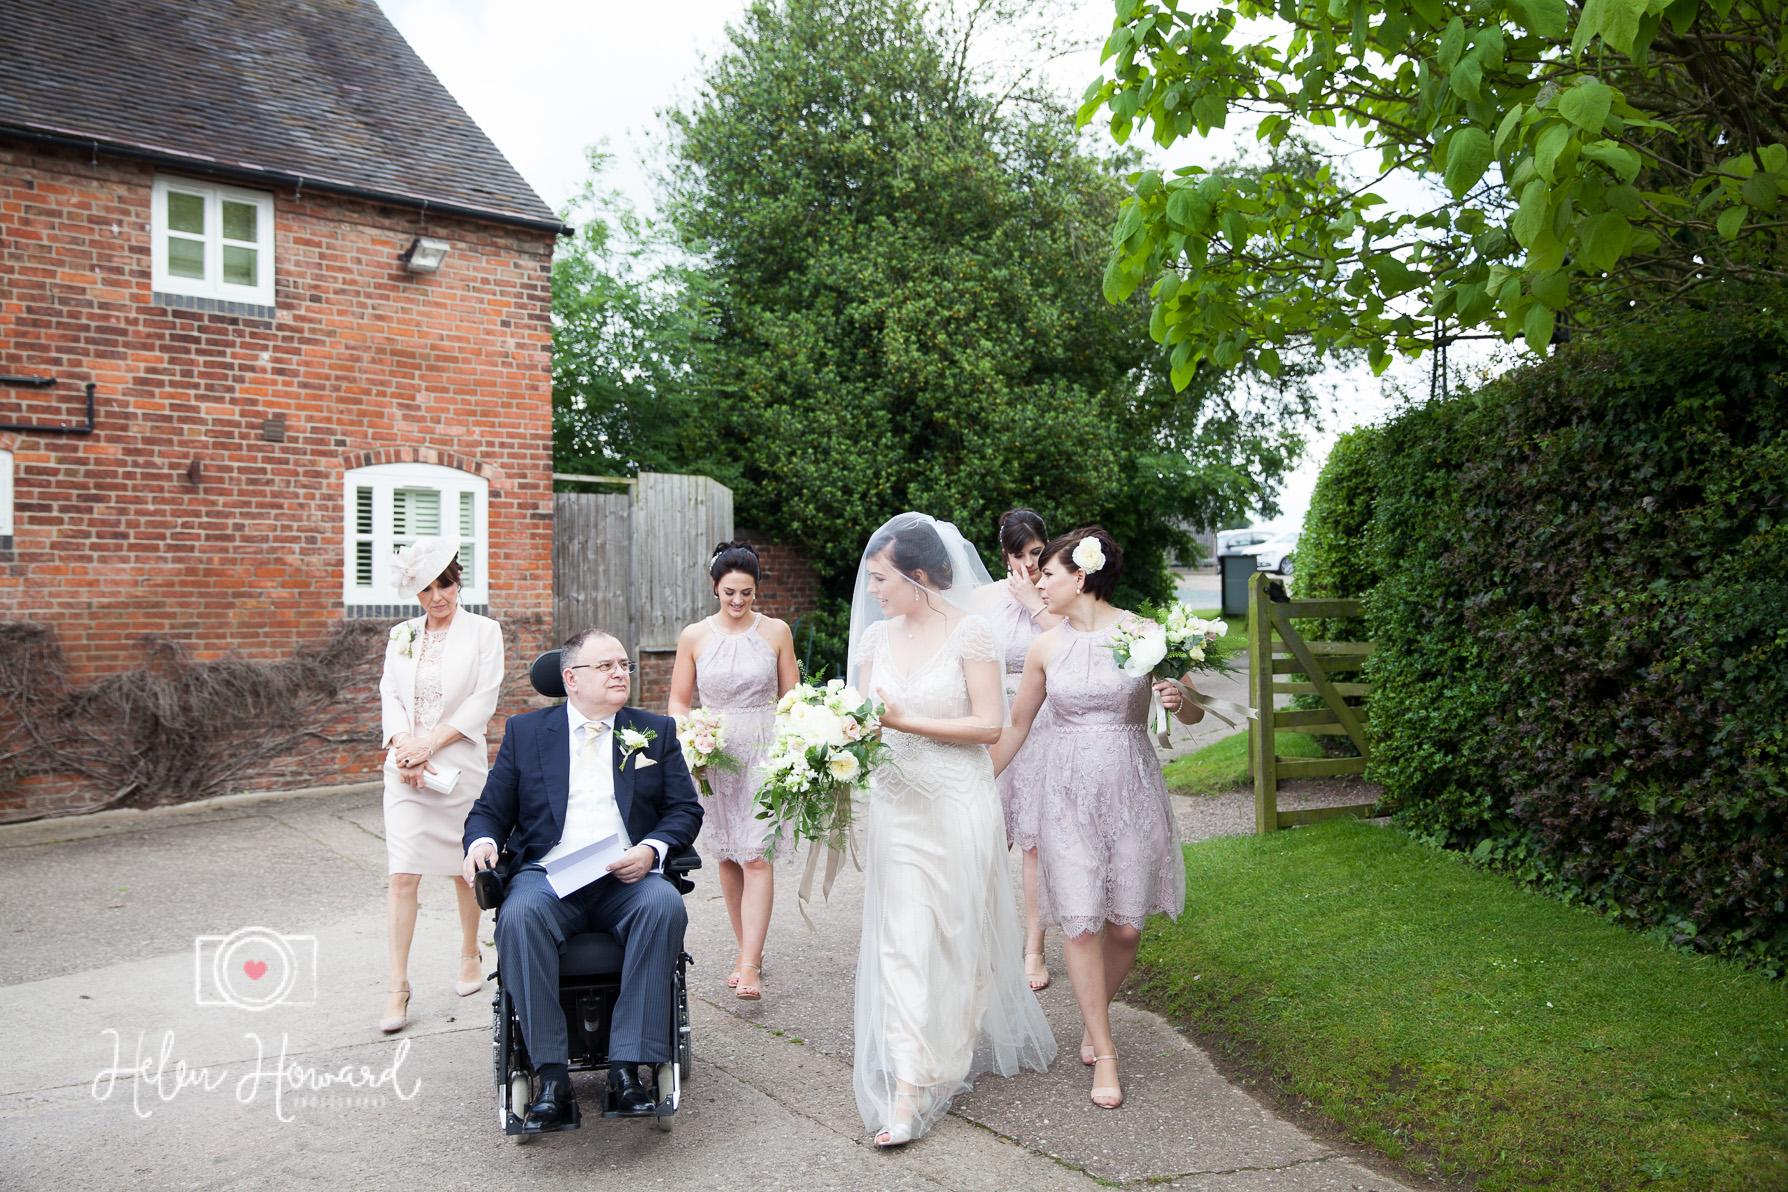 Helen Howard Photography Packington Moor Wedding-53.jpg